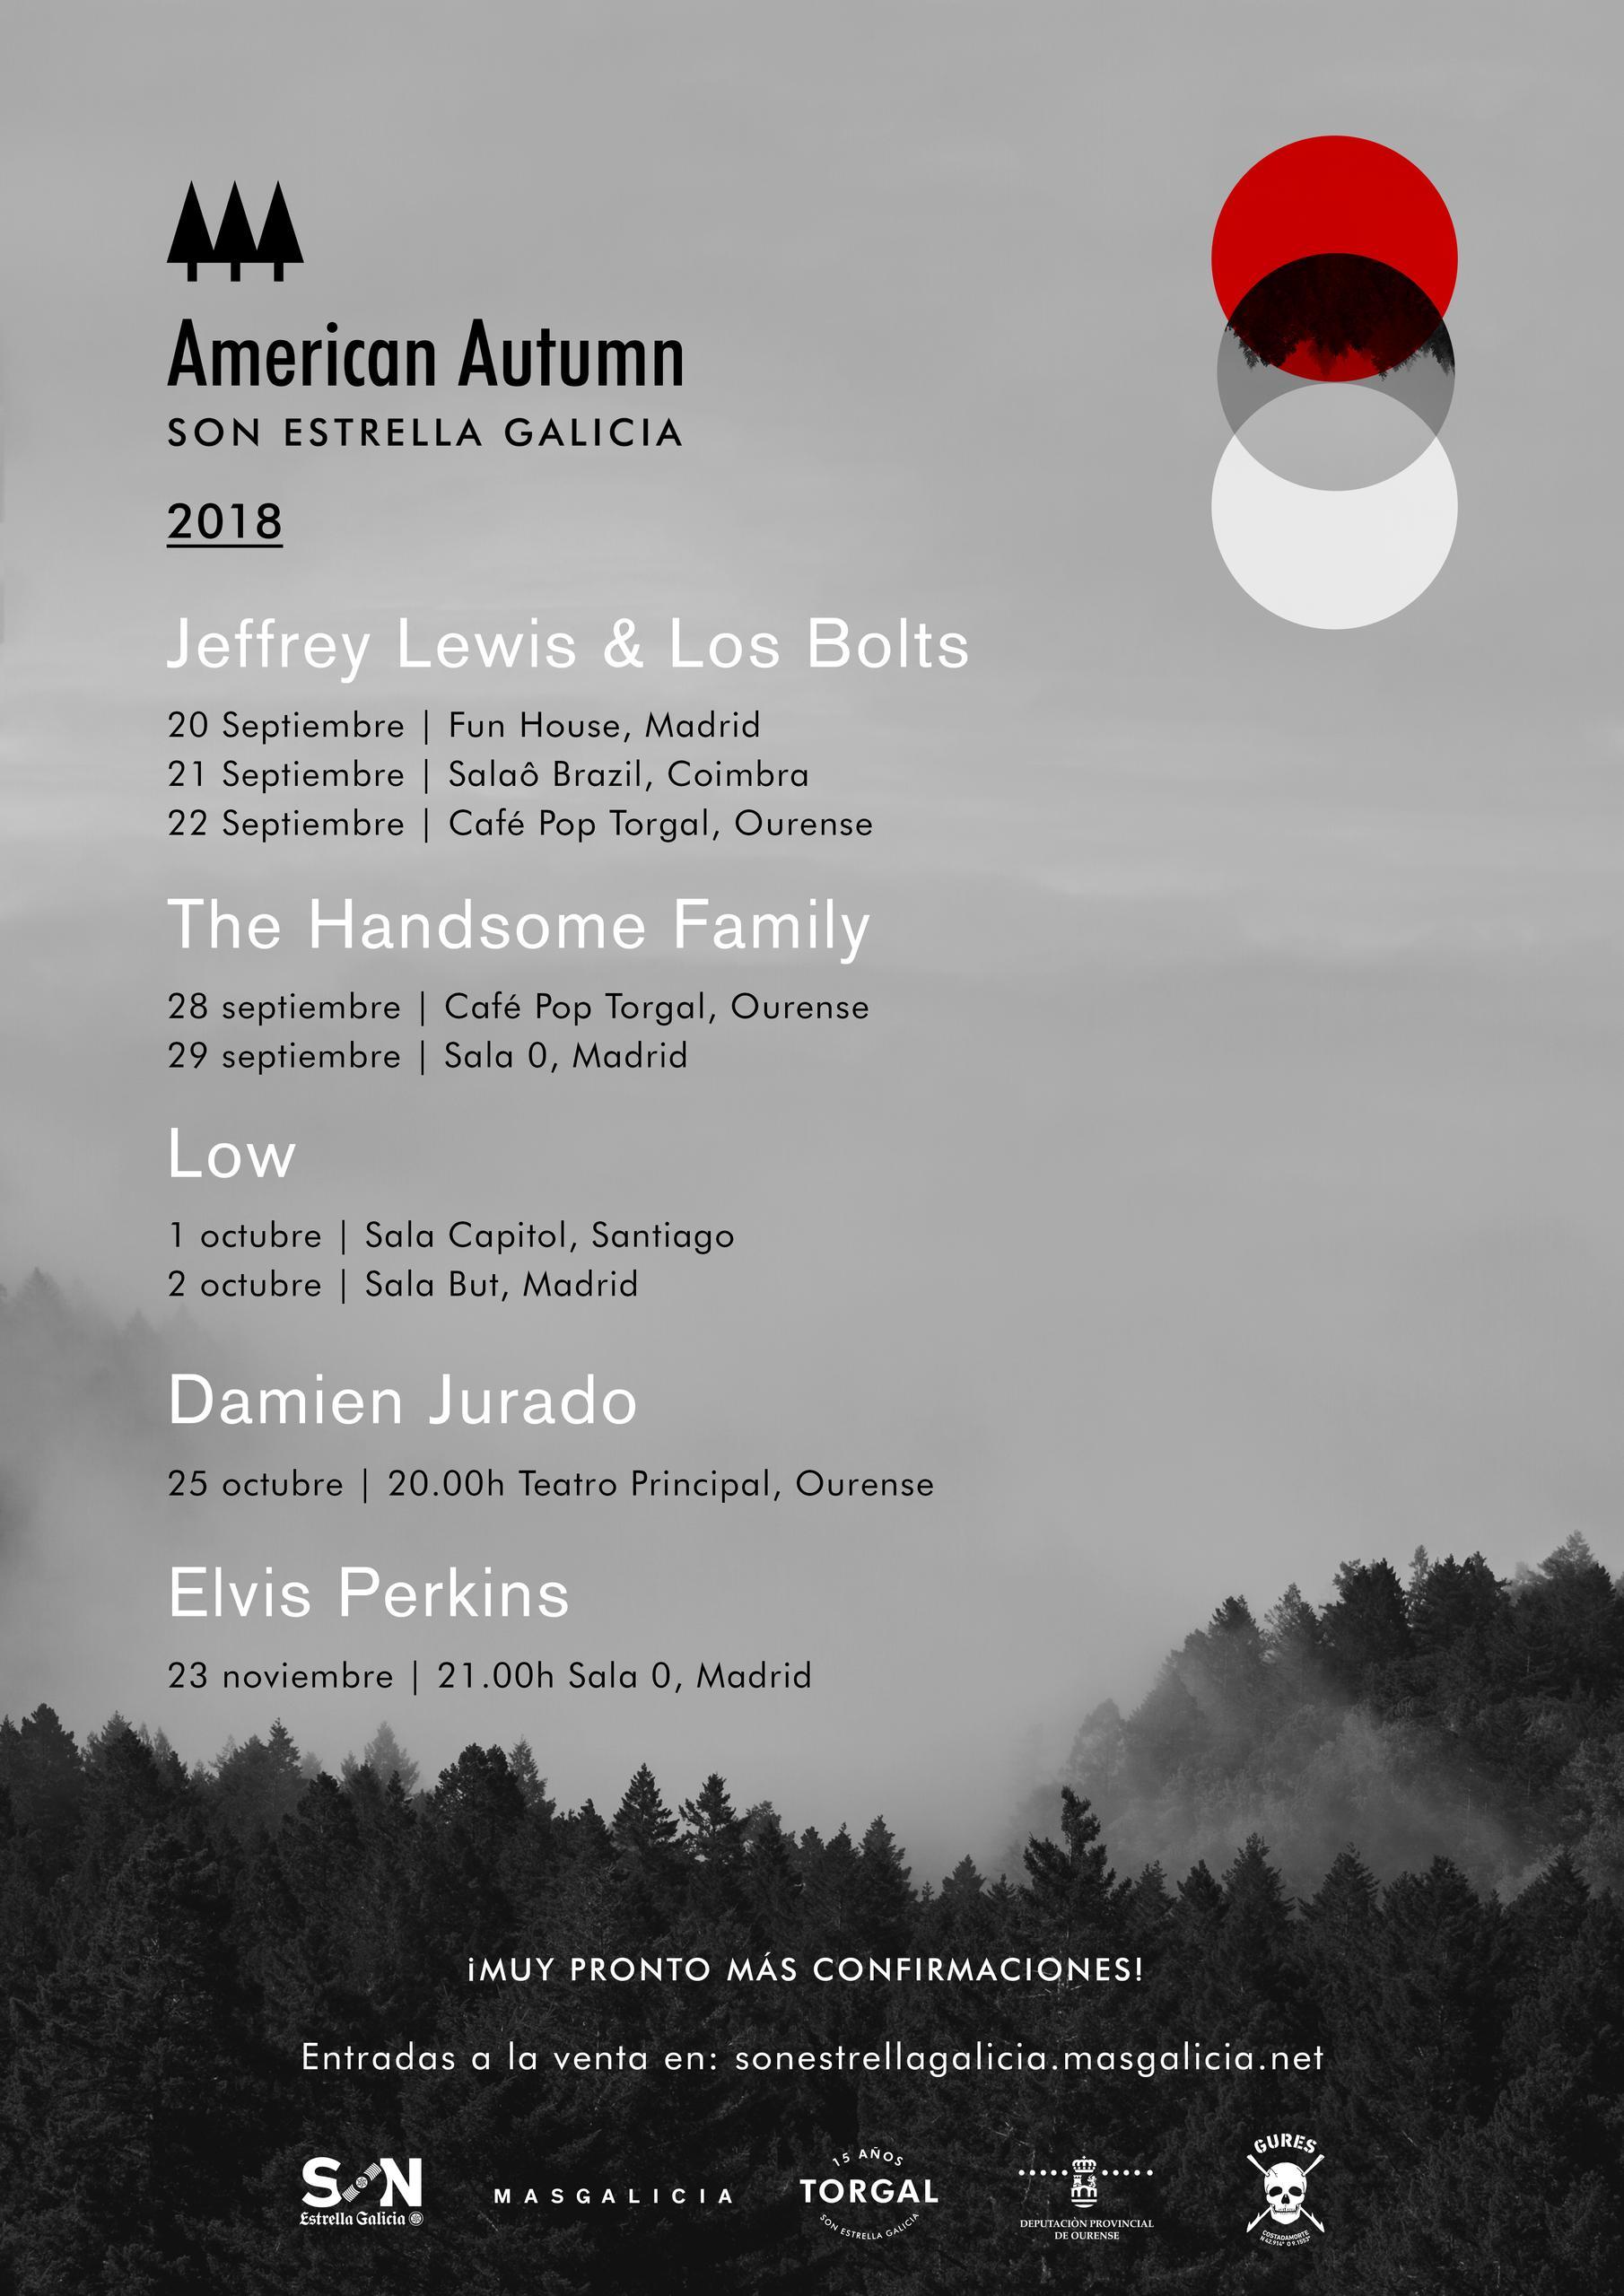 Artistas American Autumn